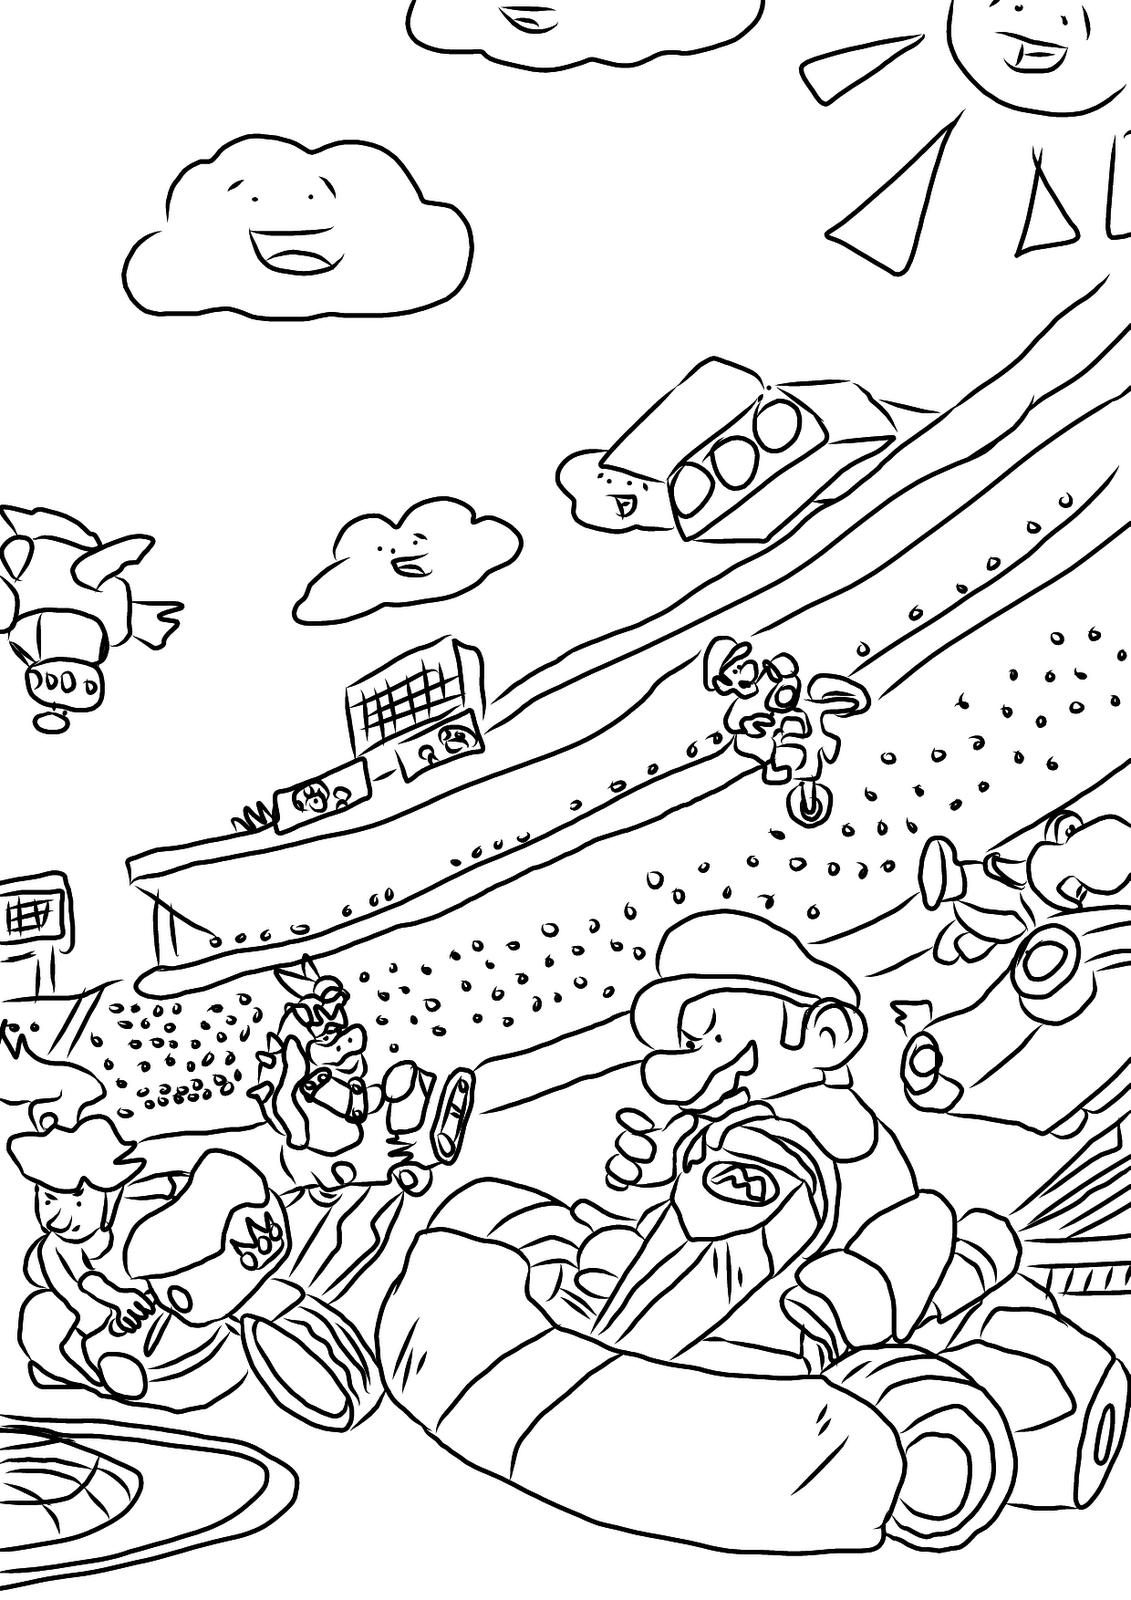 Coloriage mario kart gratuit imprimer for Mario kart coloring pages peach